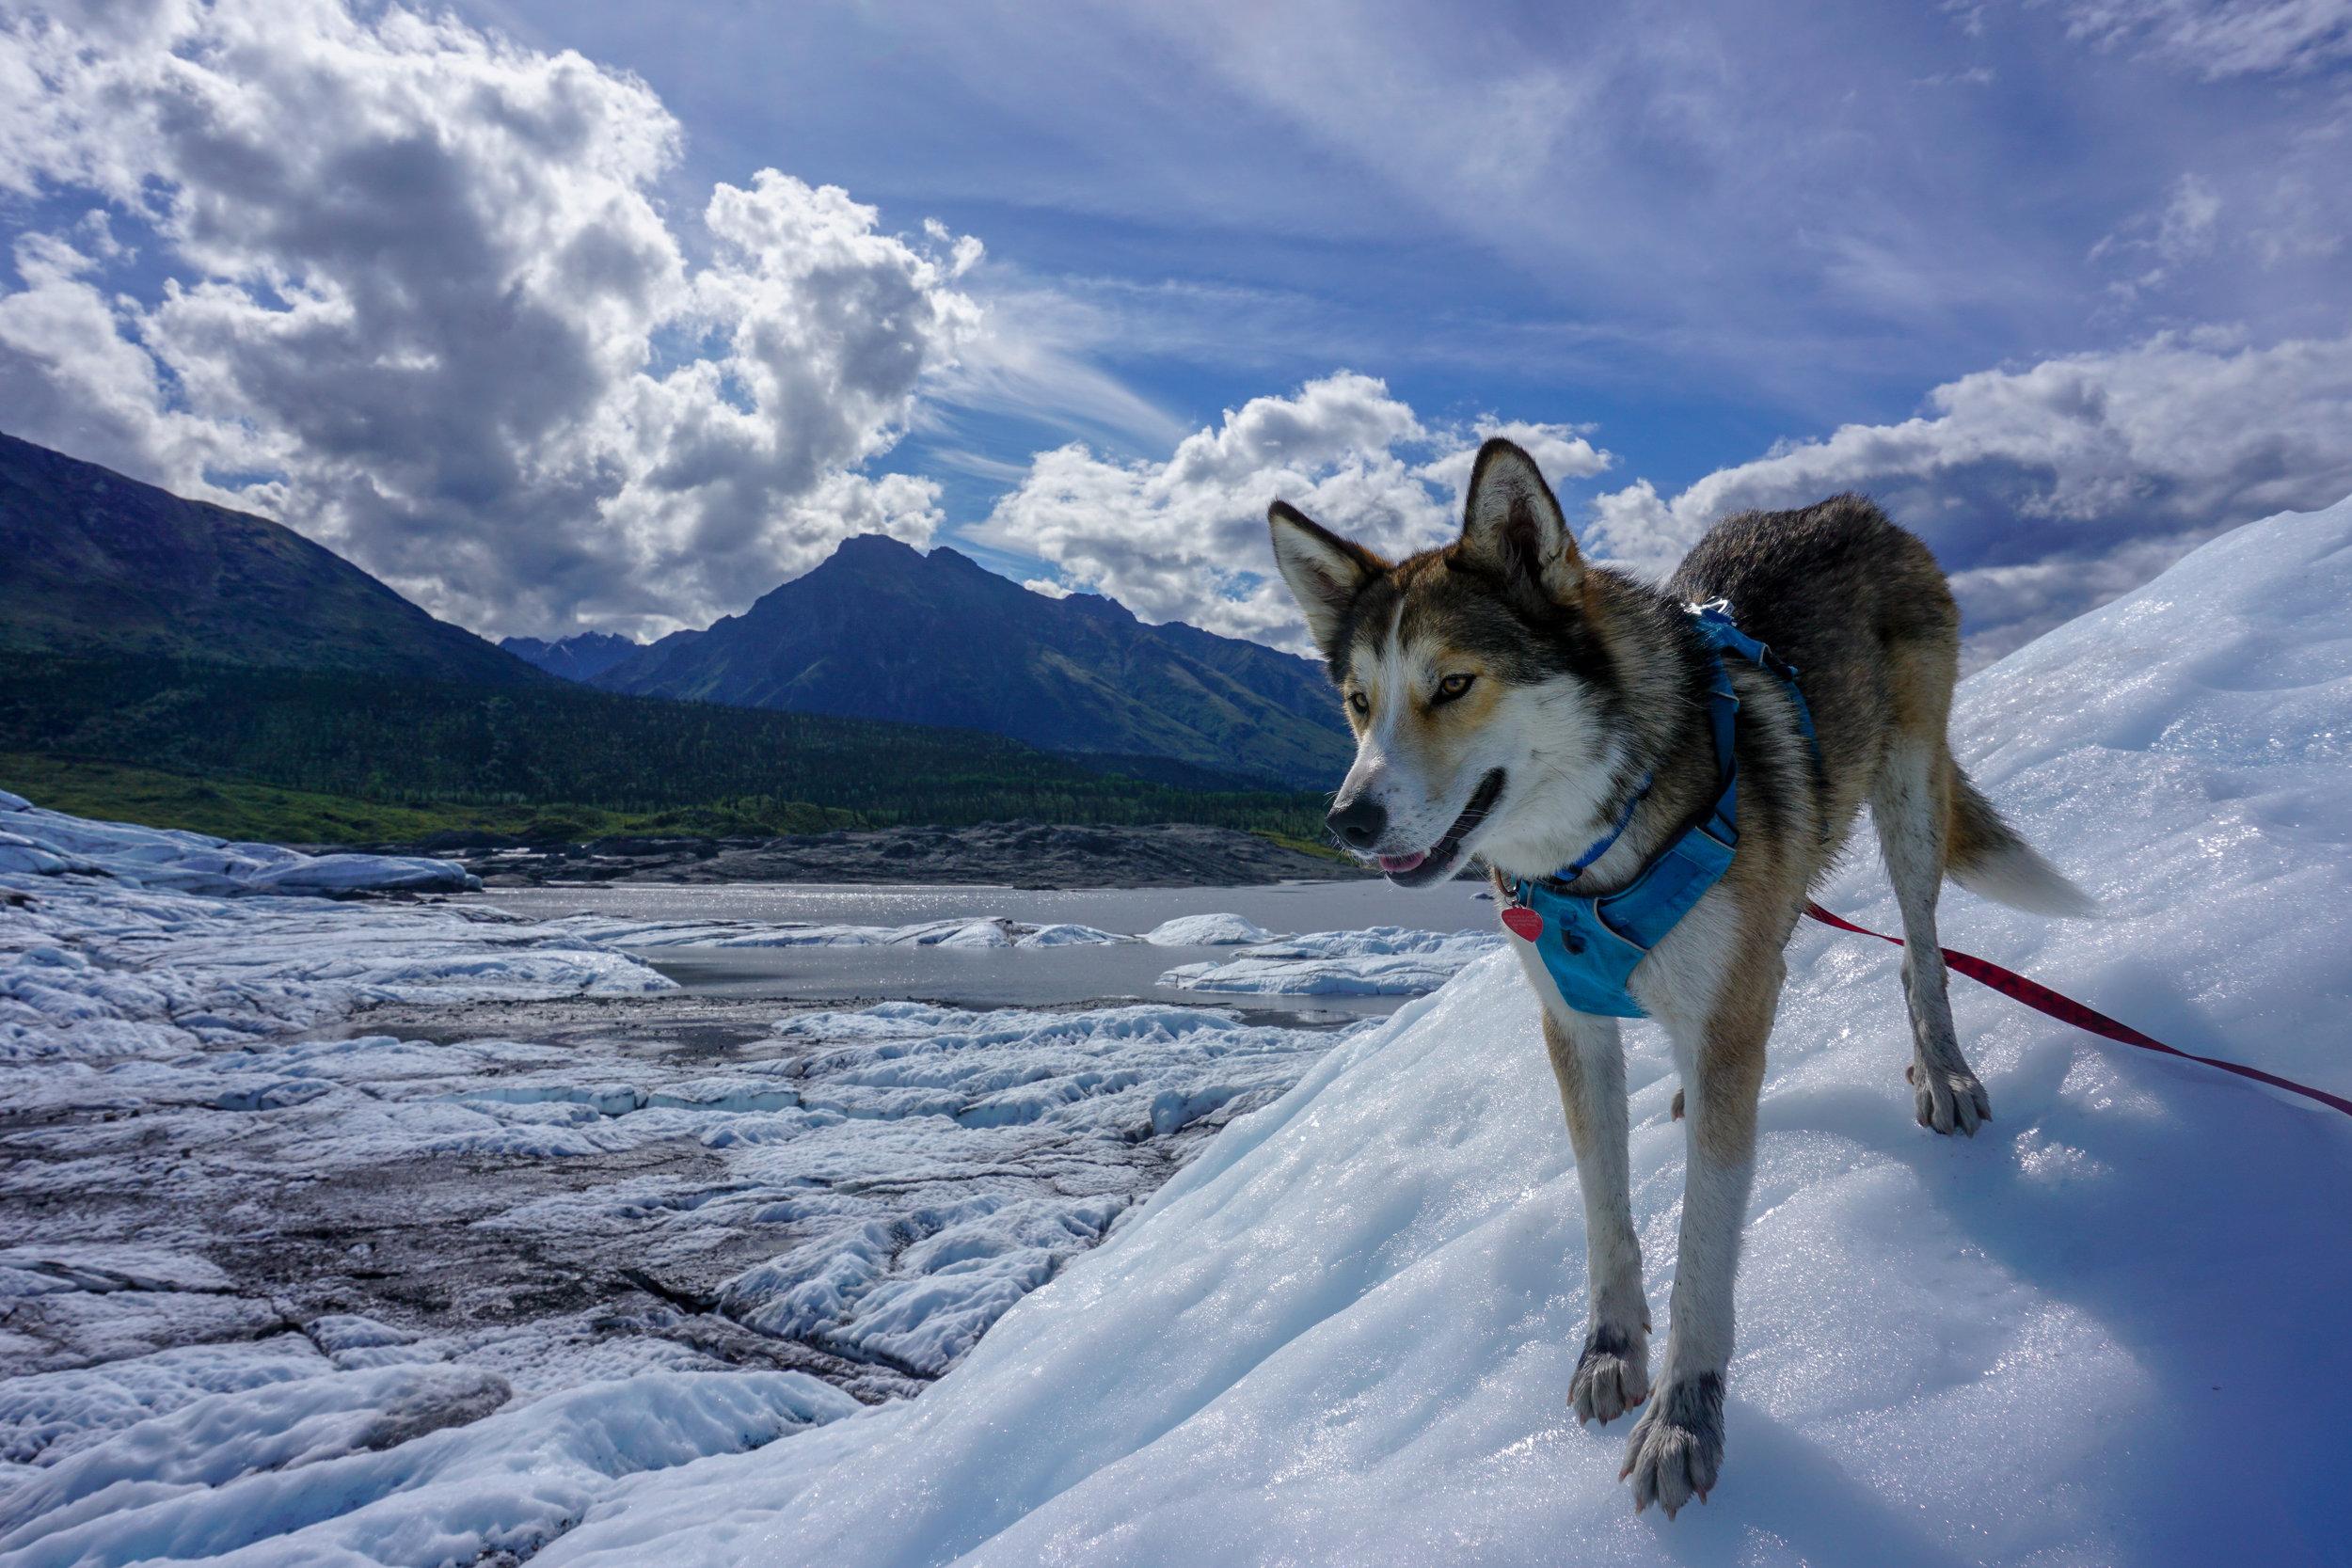 Kelsey's dog, Jasper, living the glacier life in Alaska.